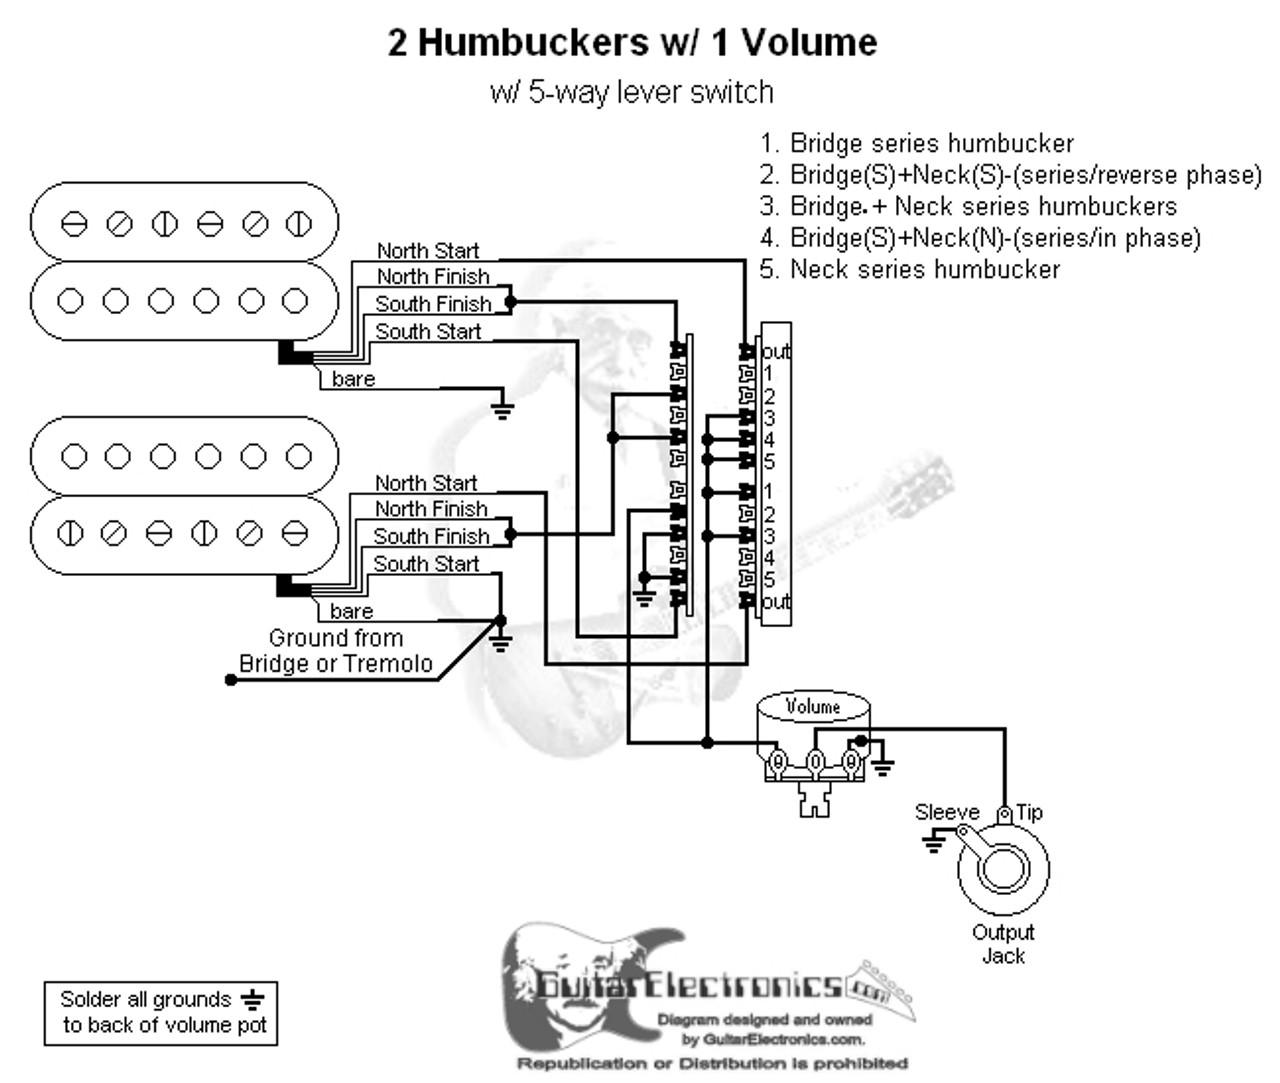 medium resolution of wiring diagram 2 humbuckers 5way lever switch 1 volume 1 tone 03 art of tone wiring diagram